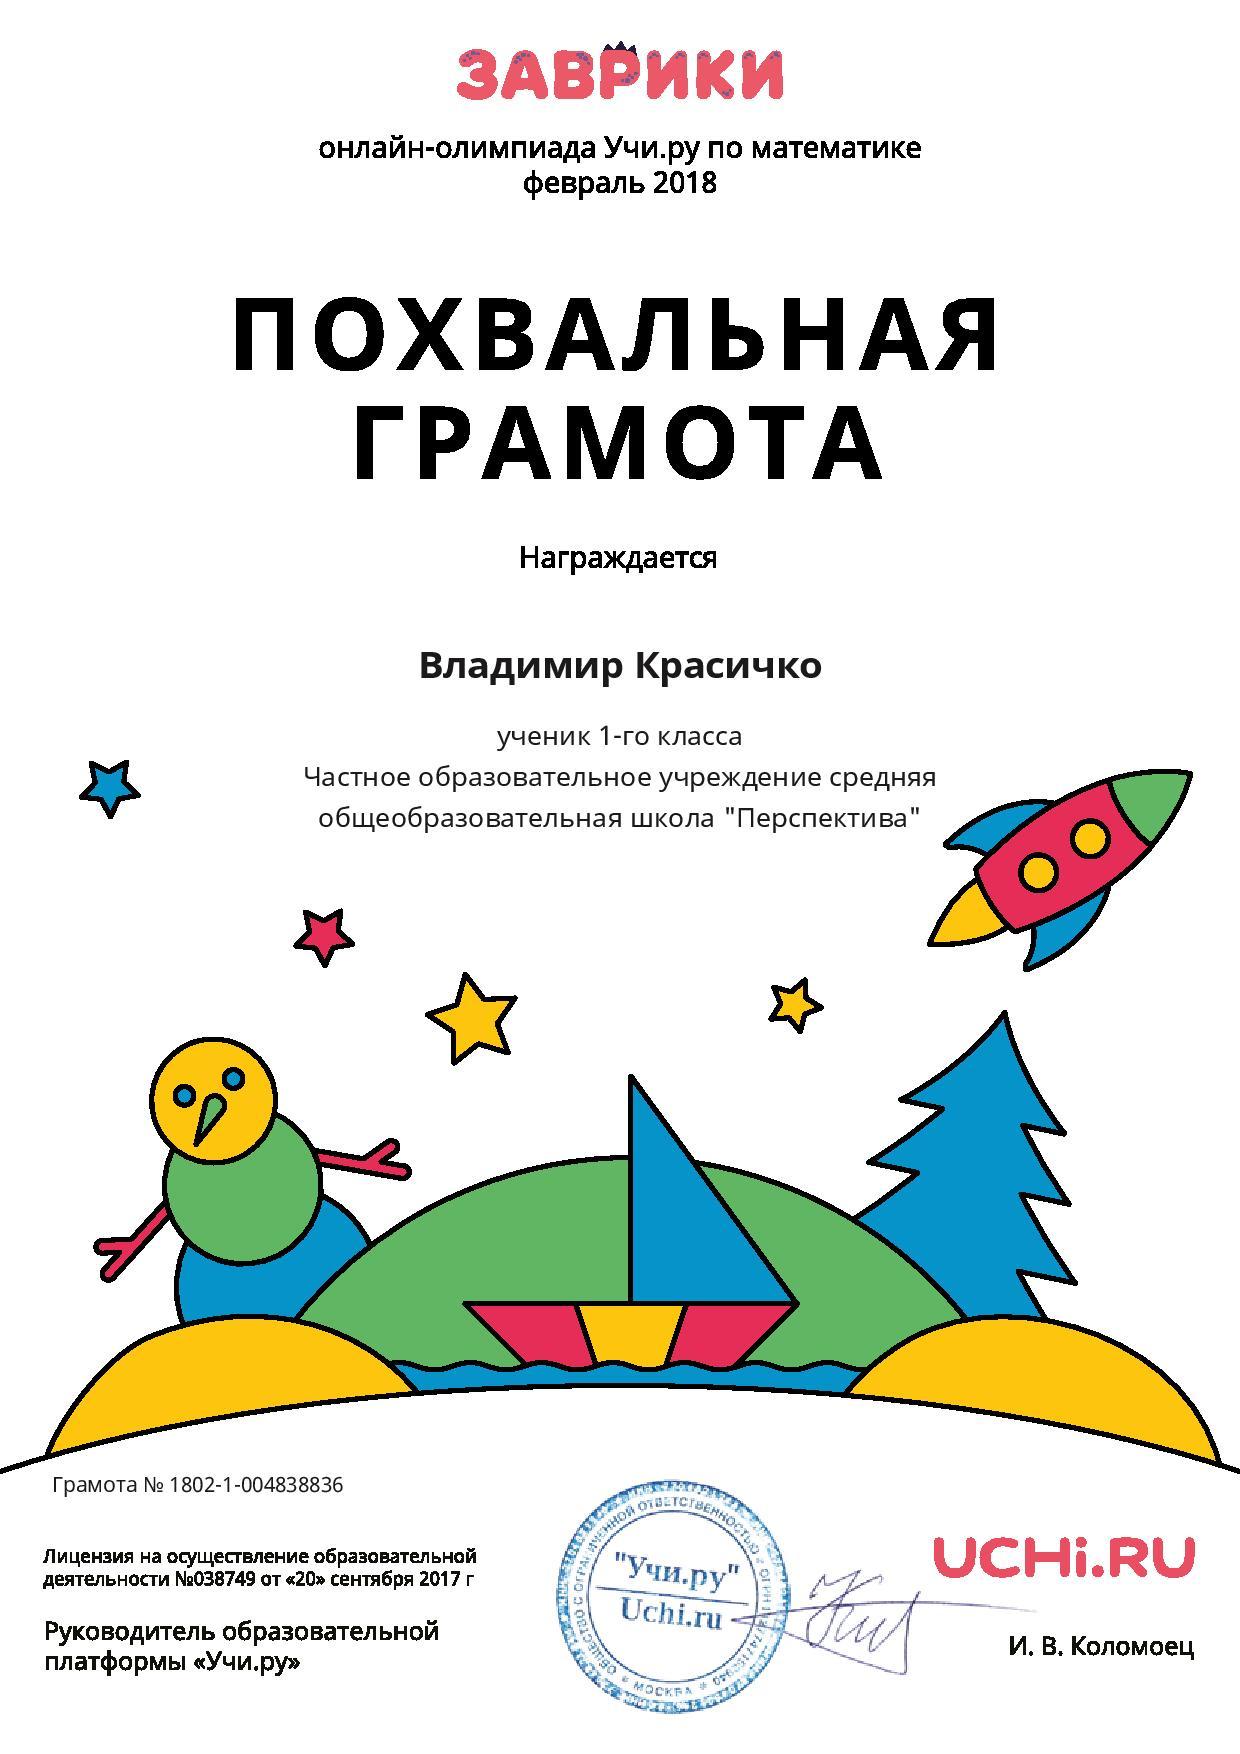 Gramota_Vladimir_Krasichko_5468962 (1)-page-001